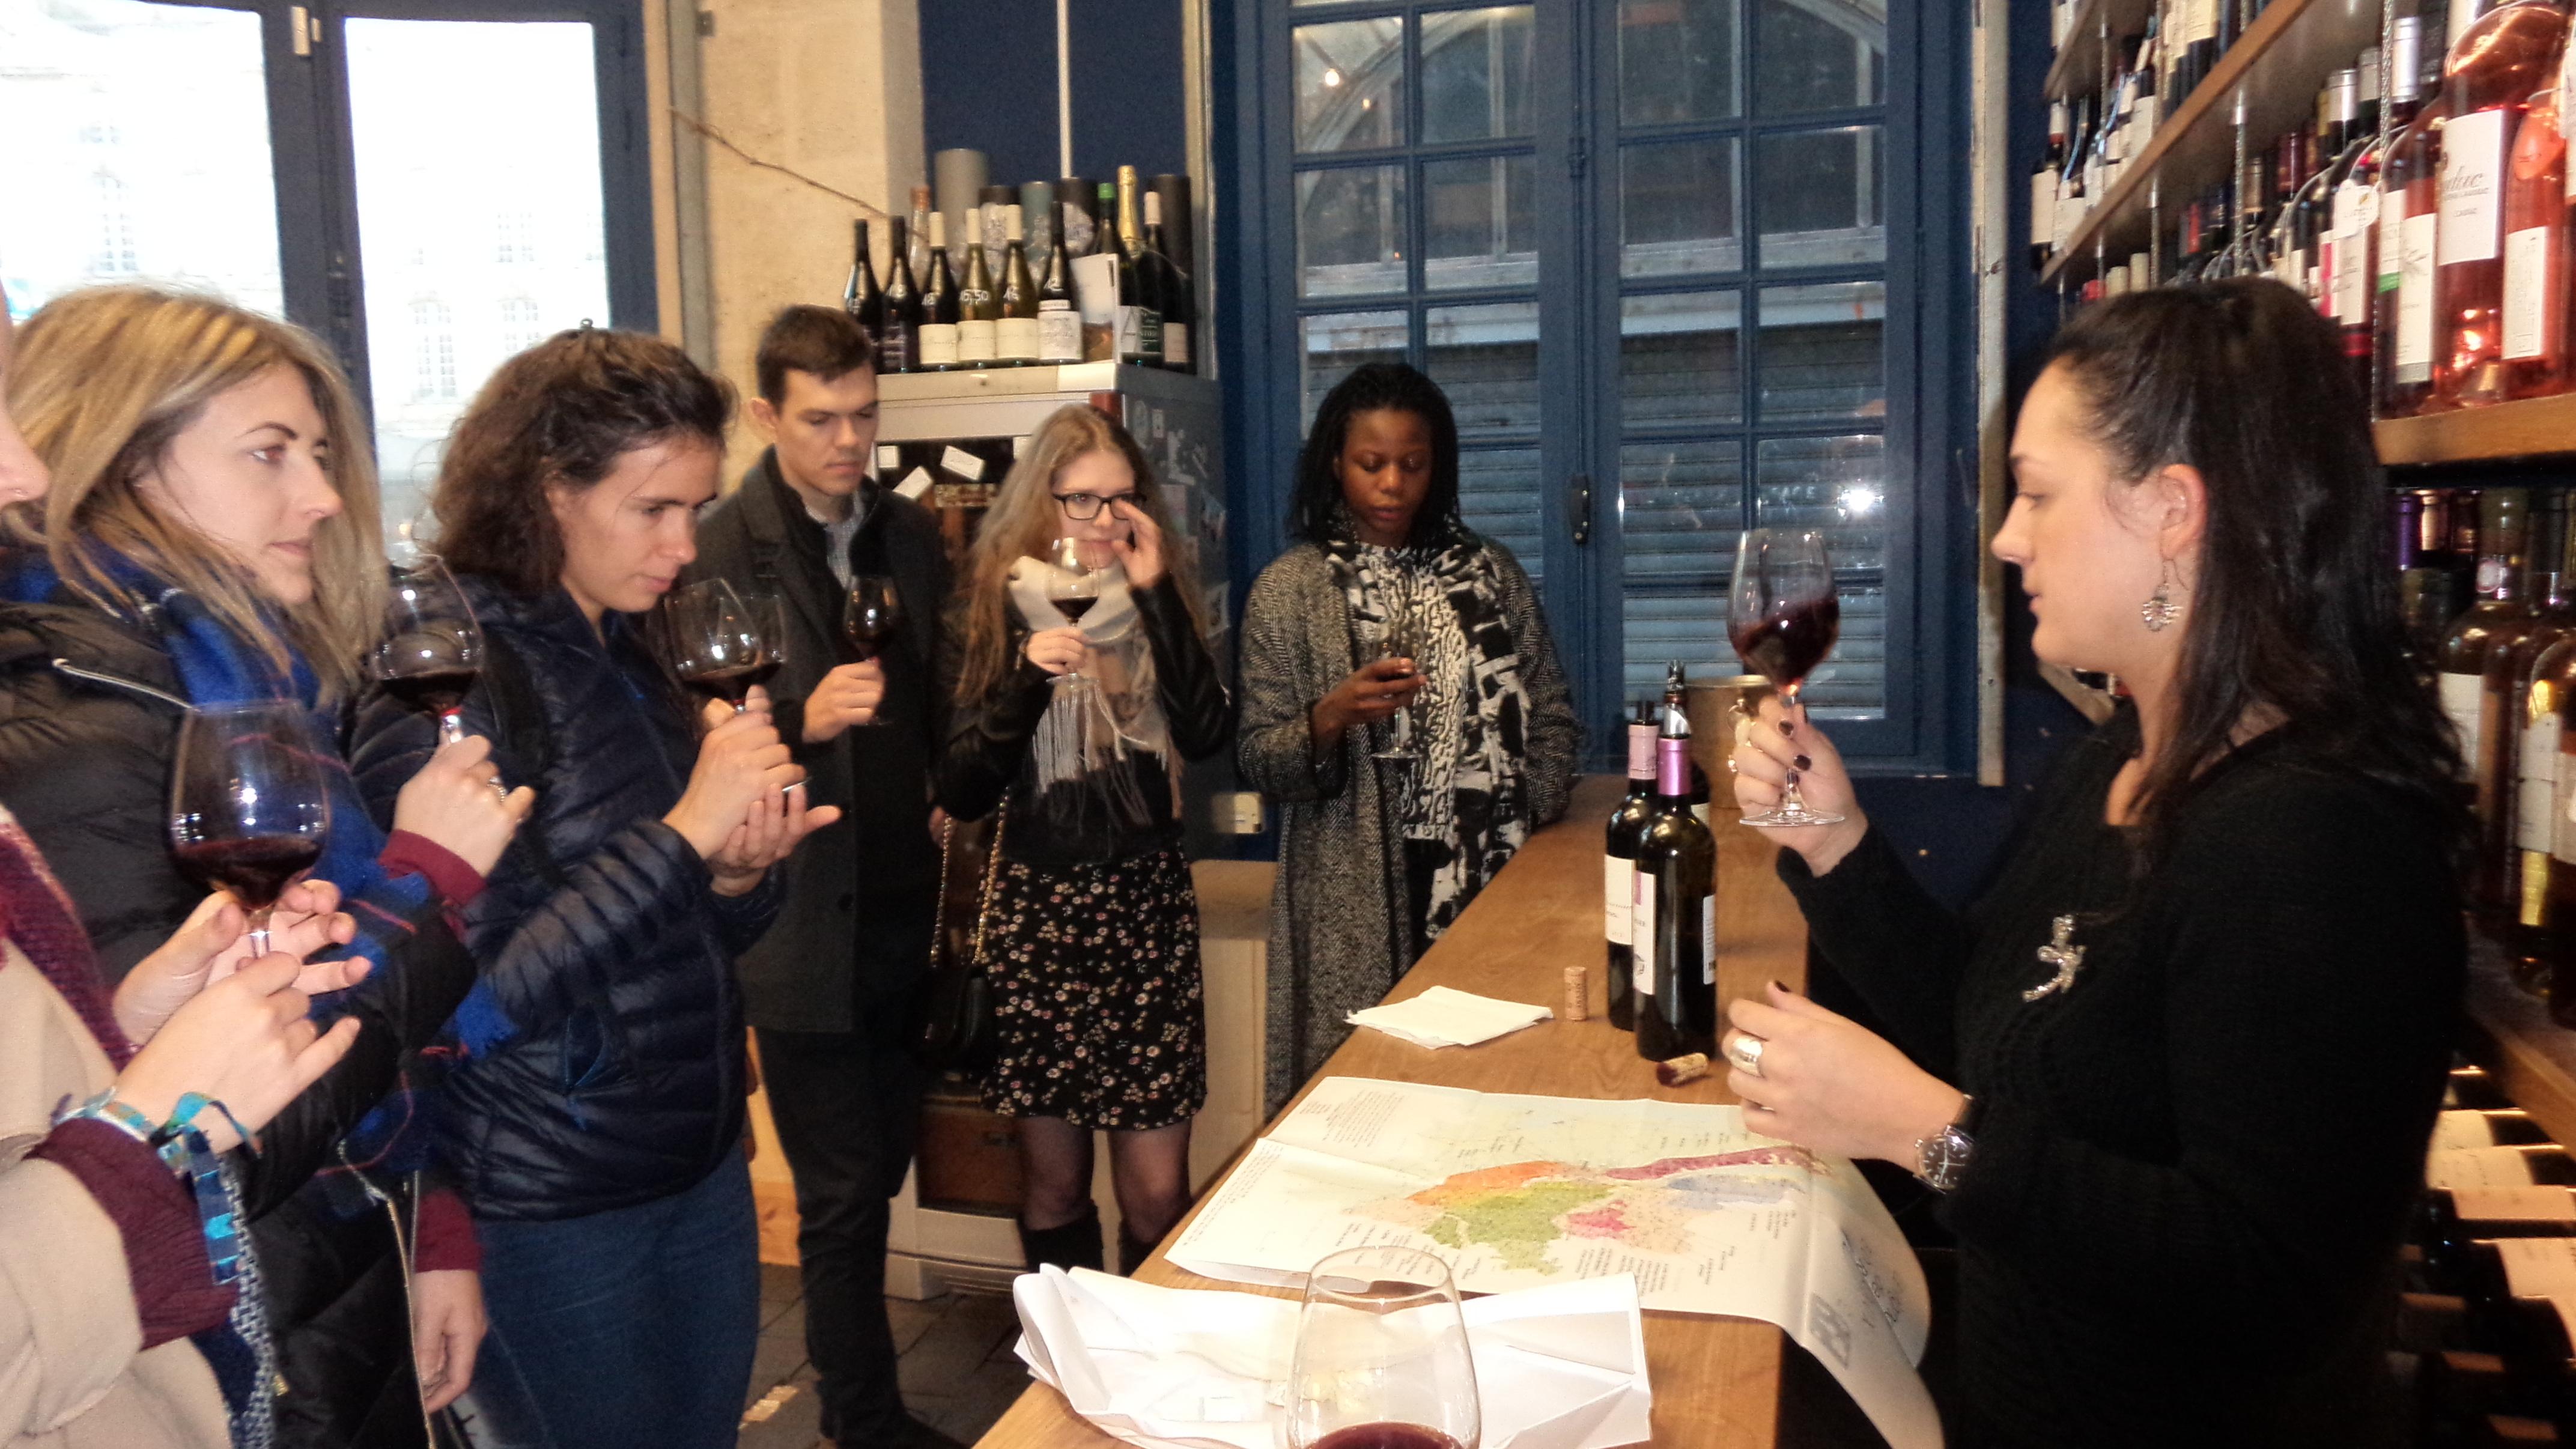 Wine tasting with HUBordeaux